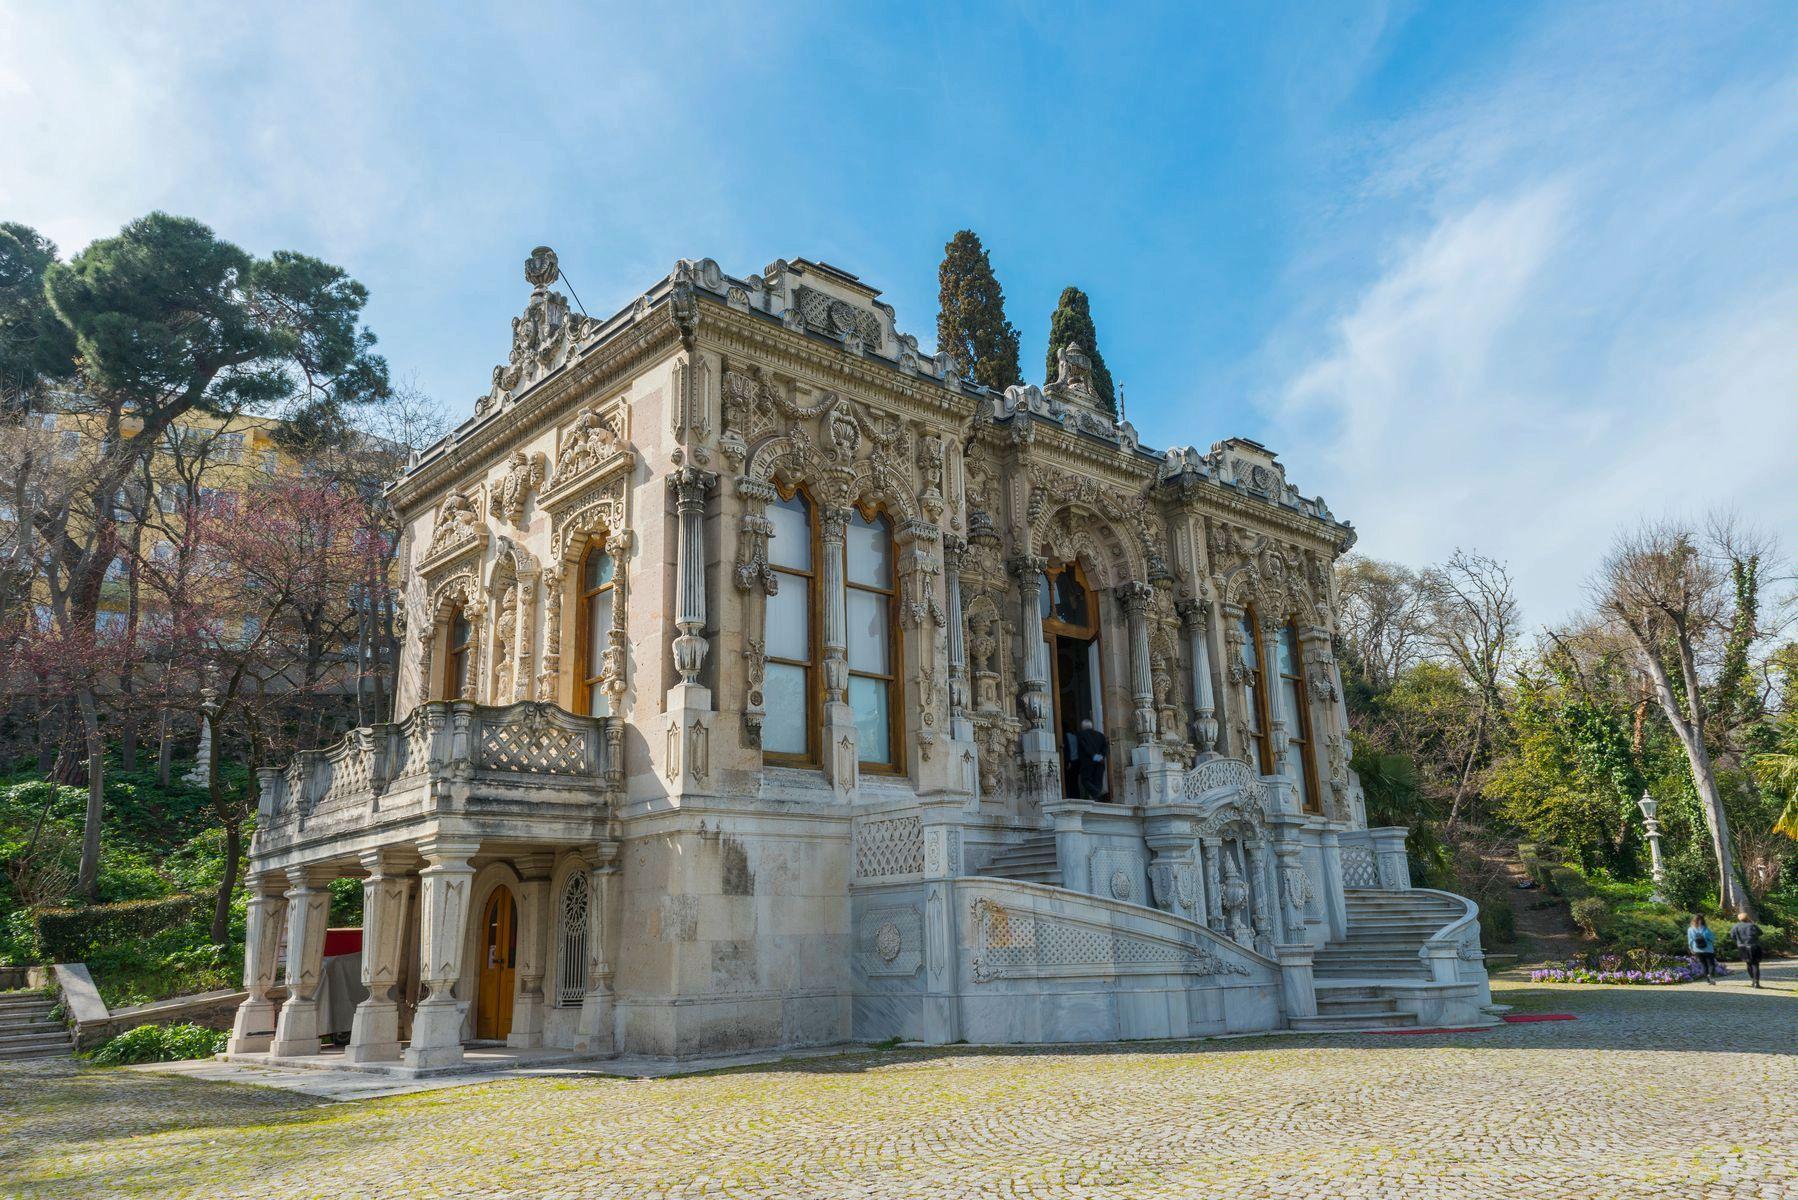 Дворец Ыхламур в Стамбуле (фотосессия)